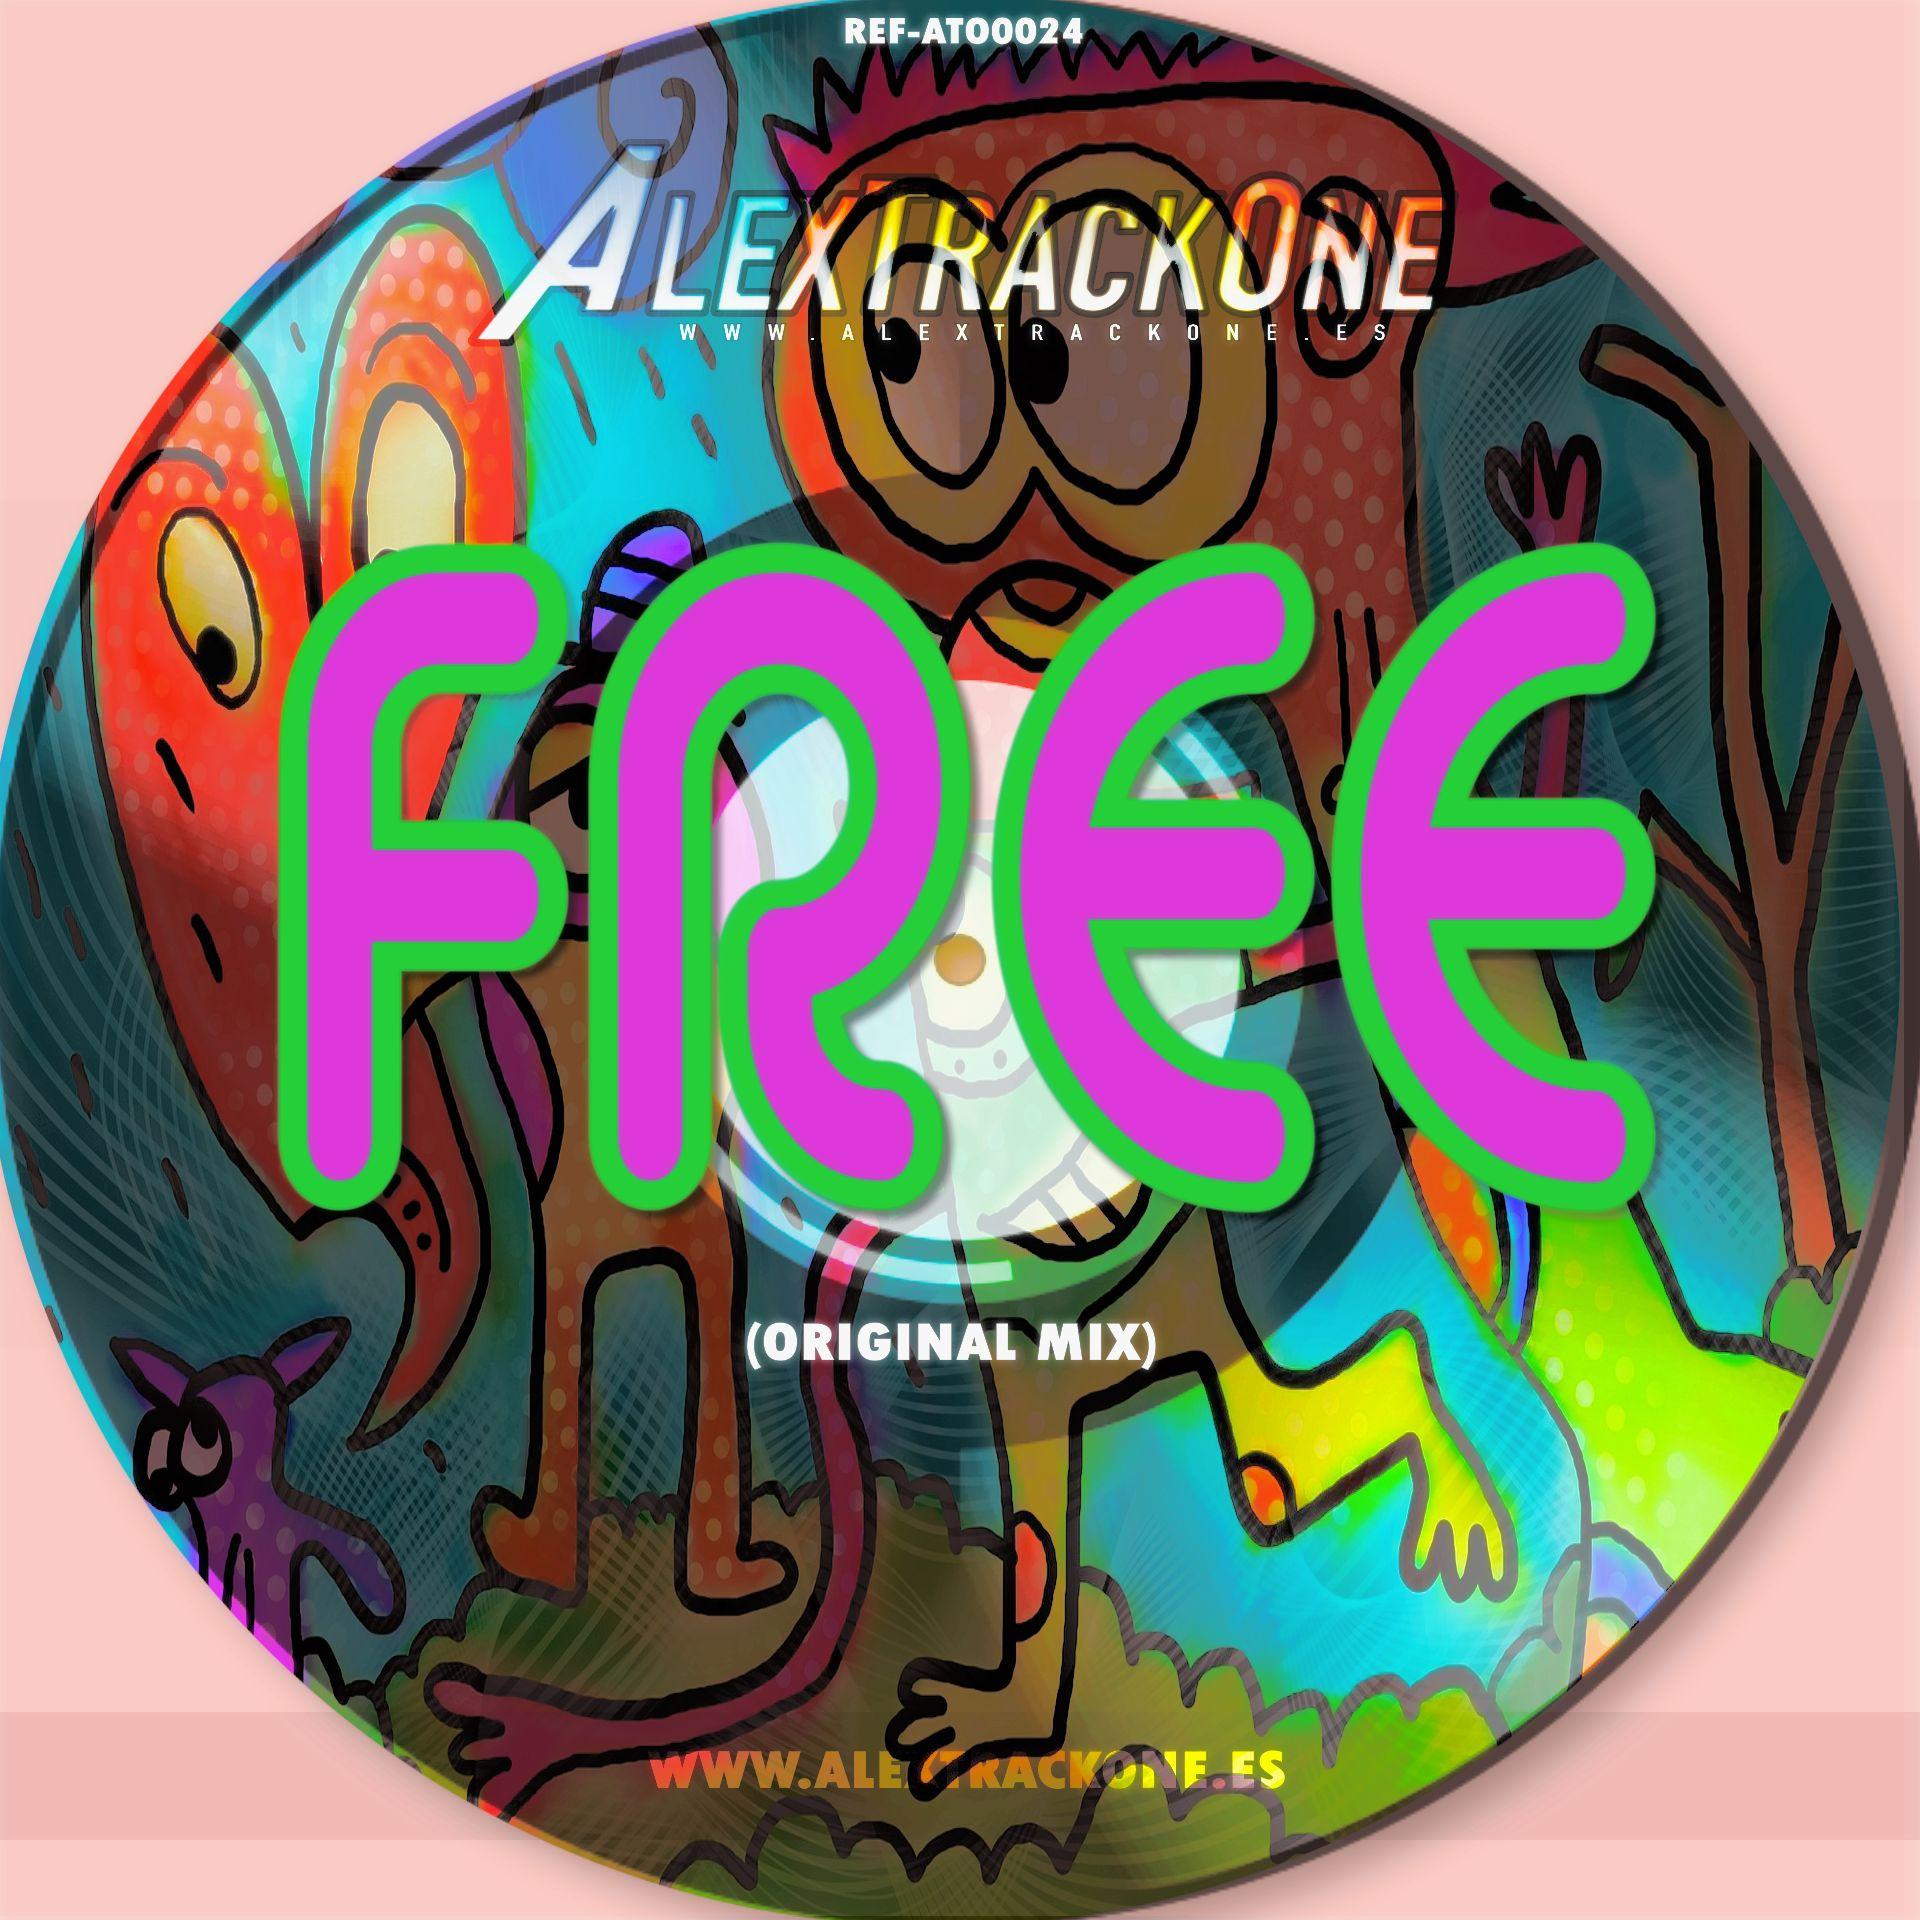 REF-ATO0024 FREE (ORIGINAL MIX) (MP3 & WAV)